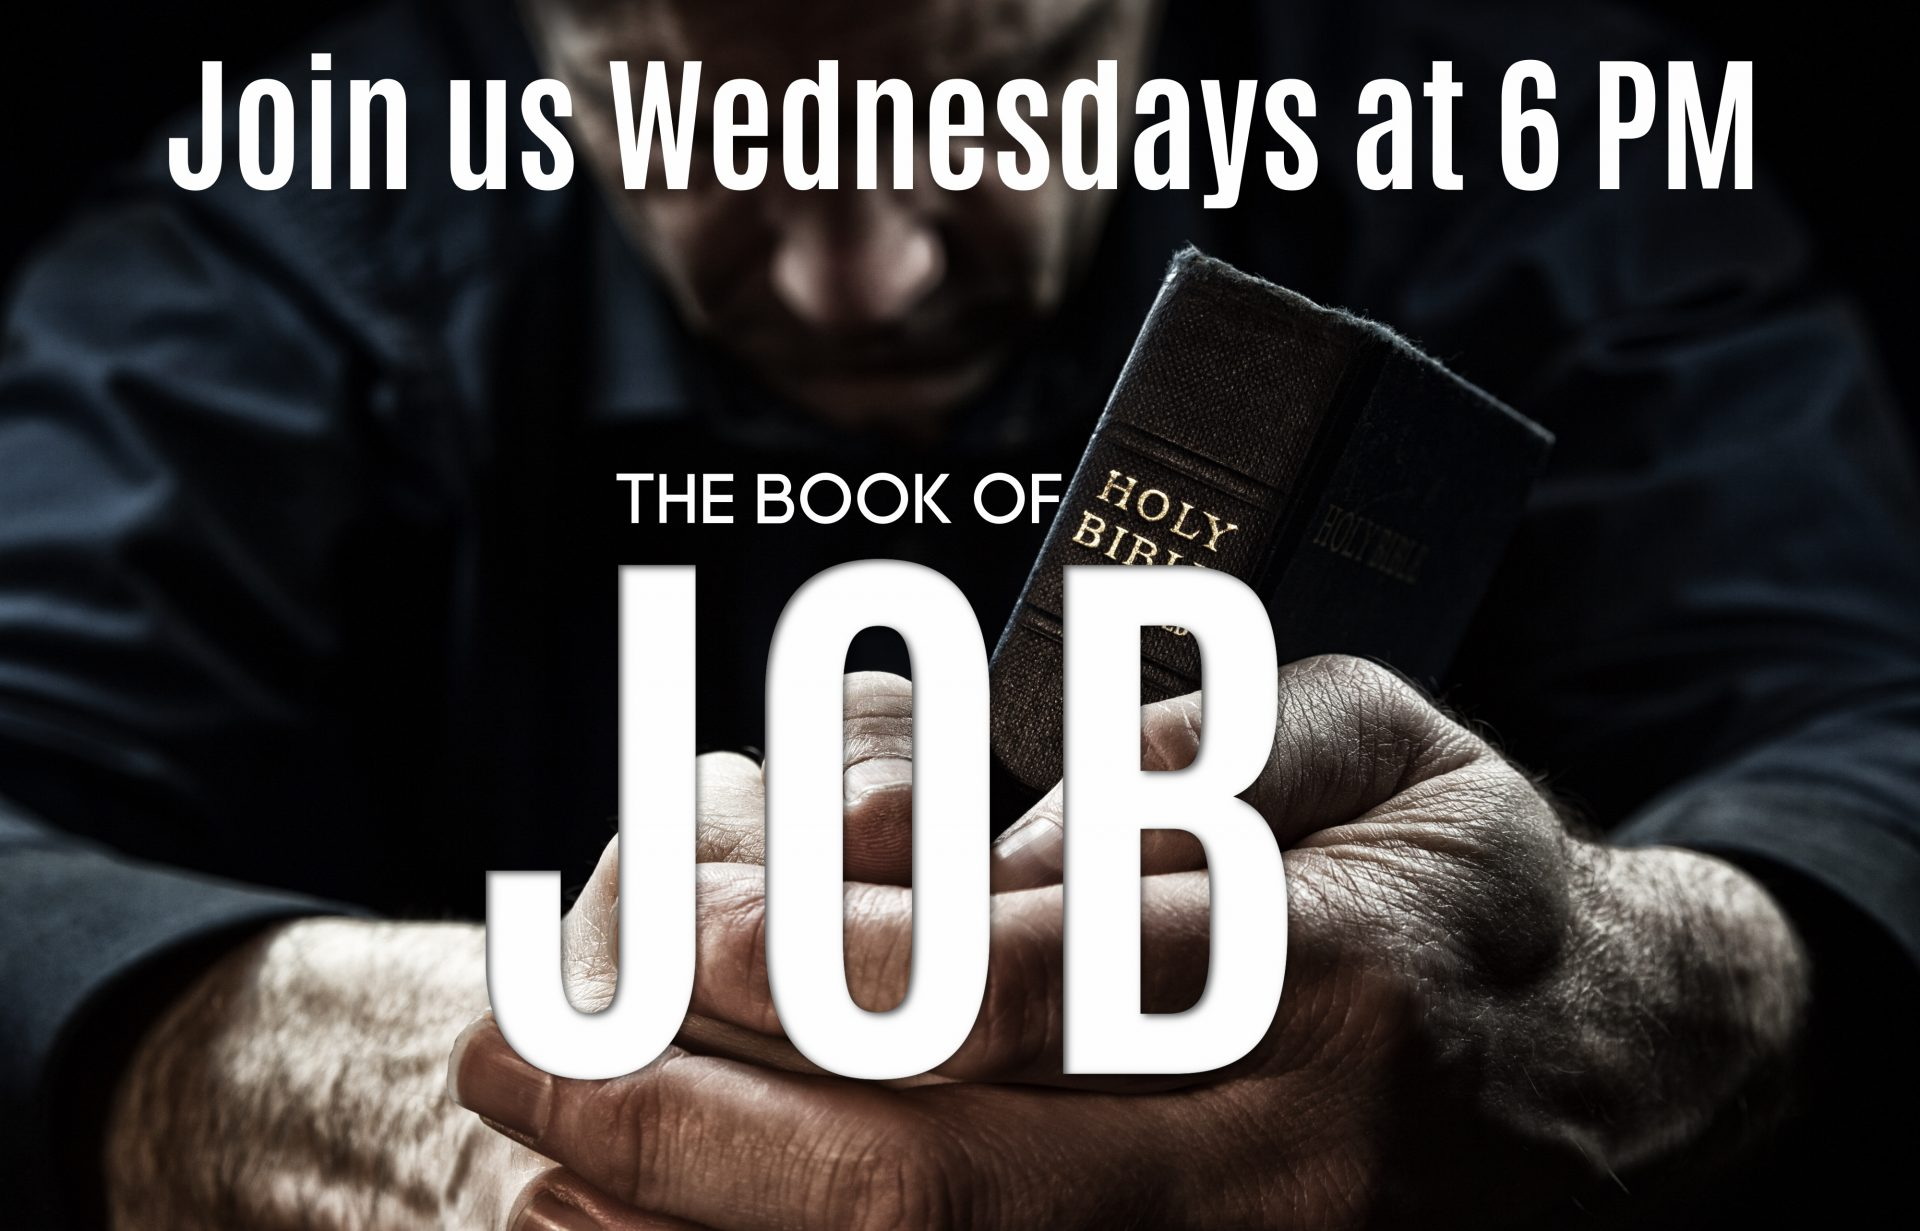 Wednesday PM Bible Study